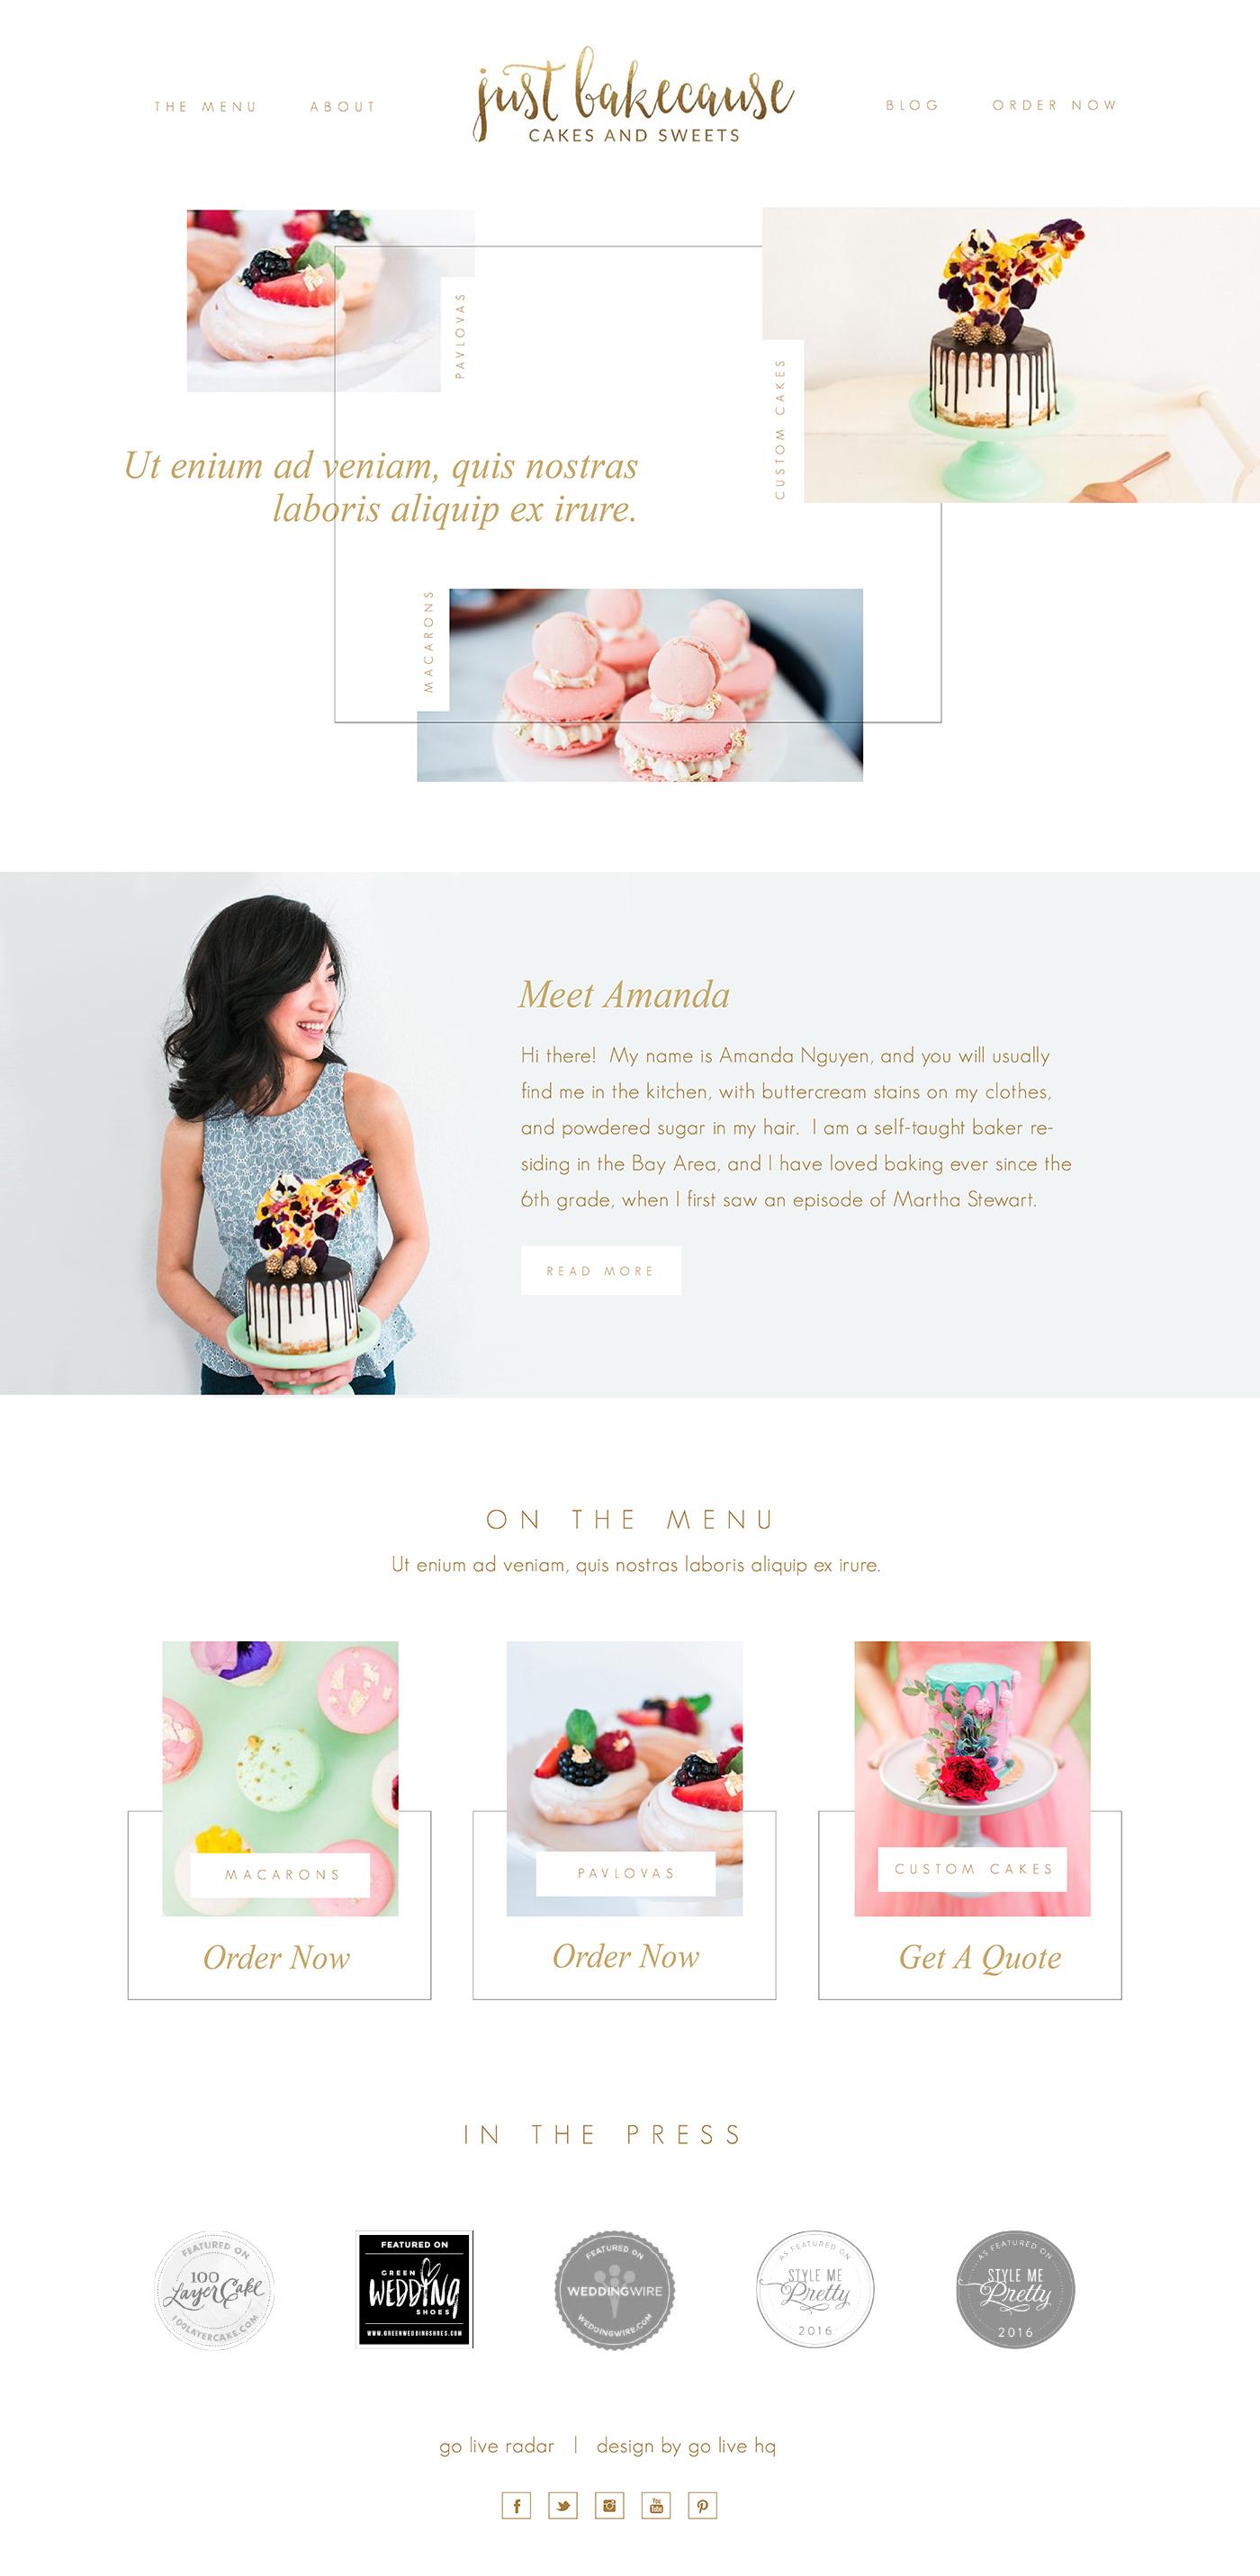 moderen bakery website by go live hq